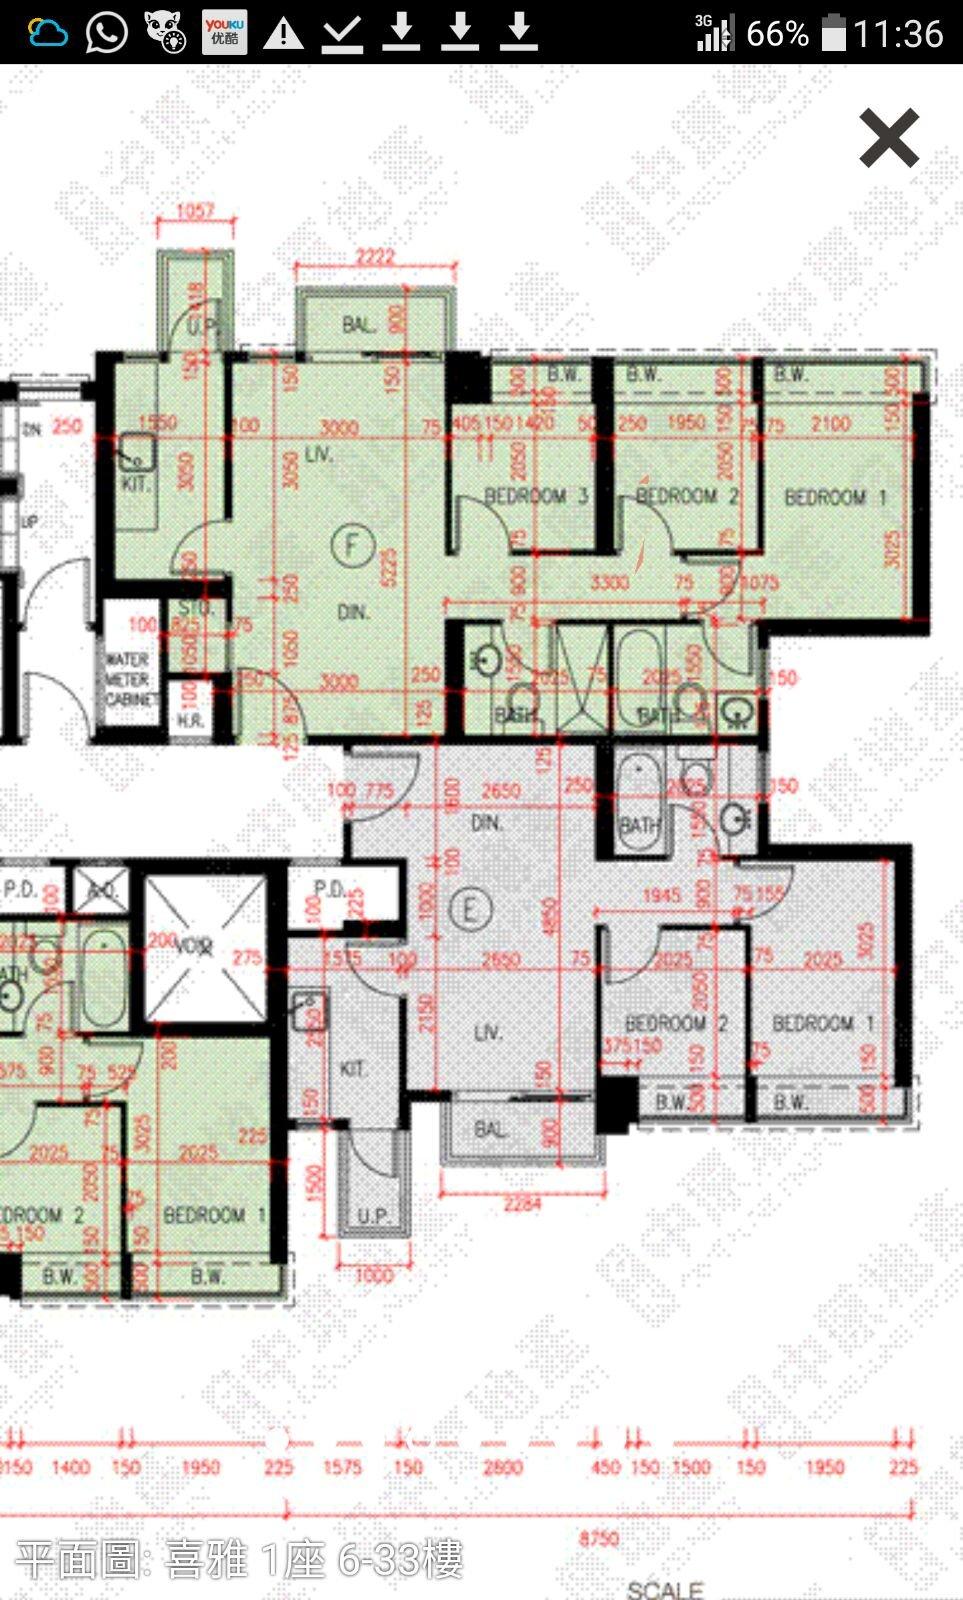 bid_deco_floorplan_1500533517.jpg